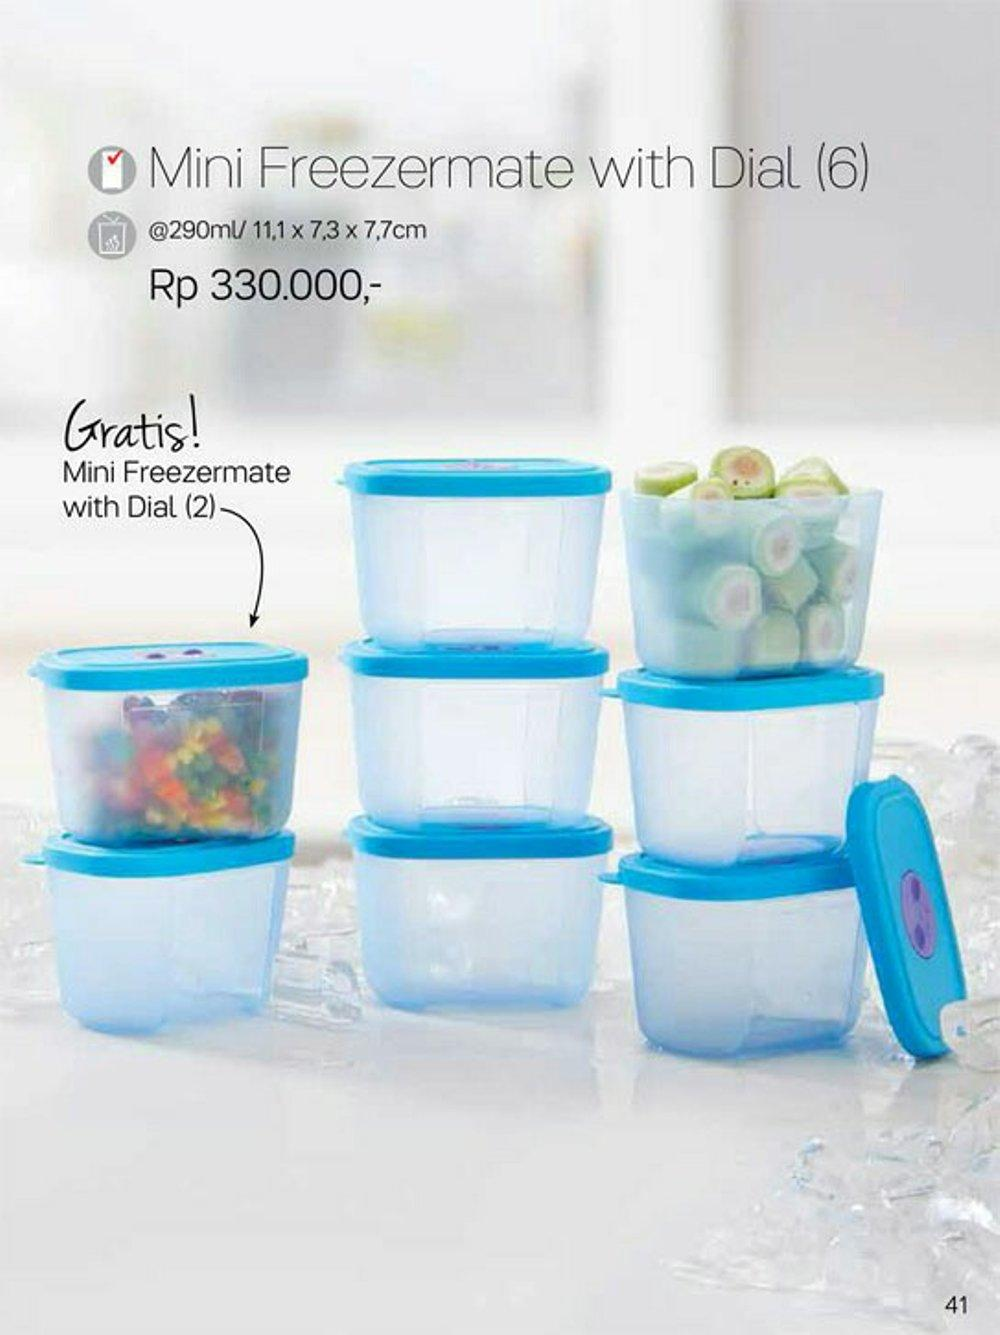 Tupperware Mini Freezermate with Dial 2 Pcs - Biru / Wadah Penyimpanan Makanan dalam Kulkas -